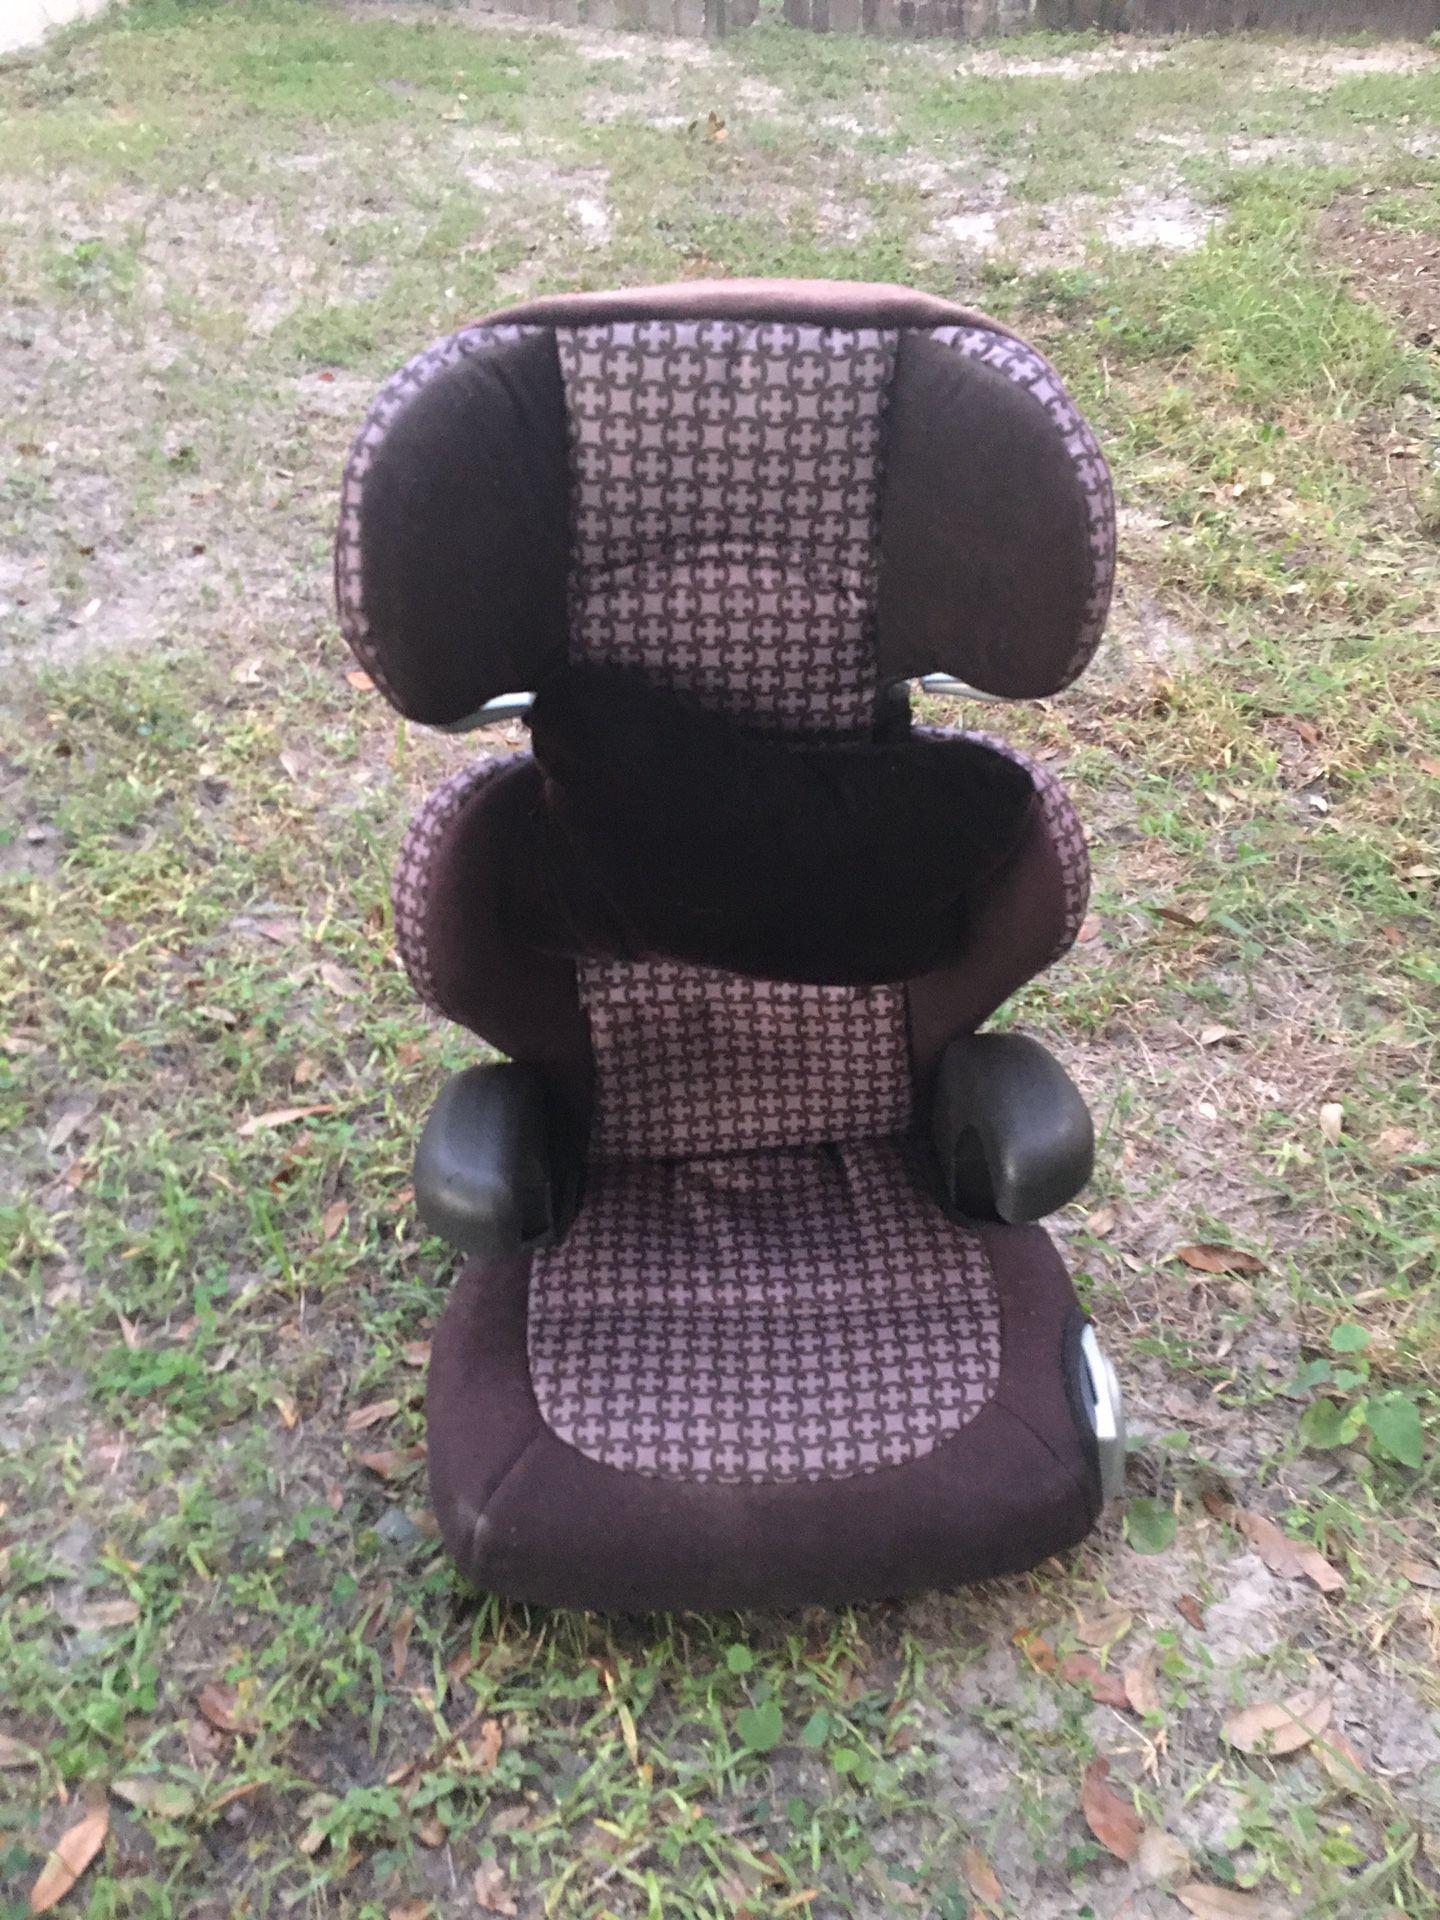 Infant Toddler Car Seat